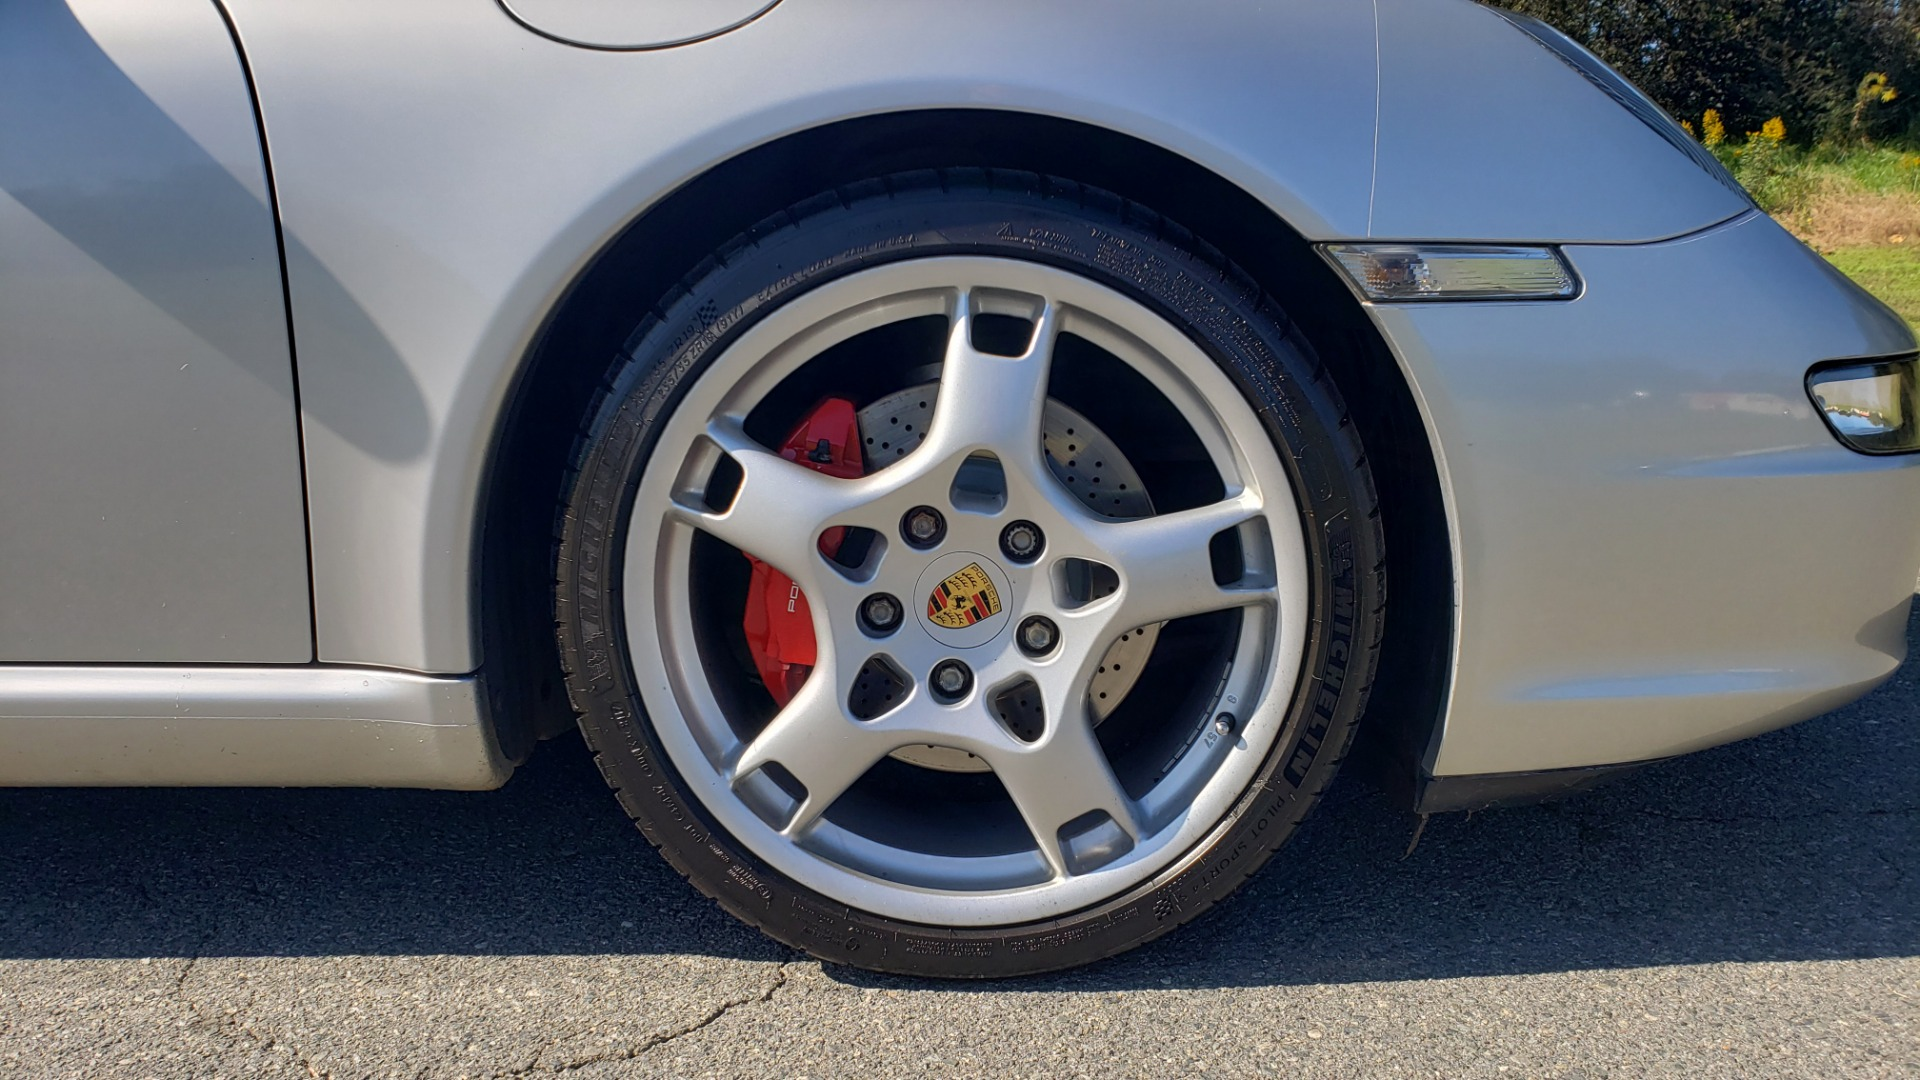 Used 2006 Porsche 911 CARRERA S / 5-SPD AUTO / SPORT CHRONO / NAV / BOSE / SUNROOF for sale Sold at Formula Imports in Charlotte NC 28227 82